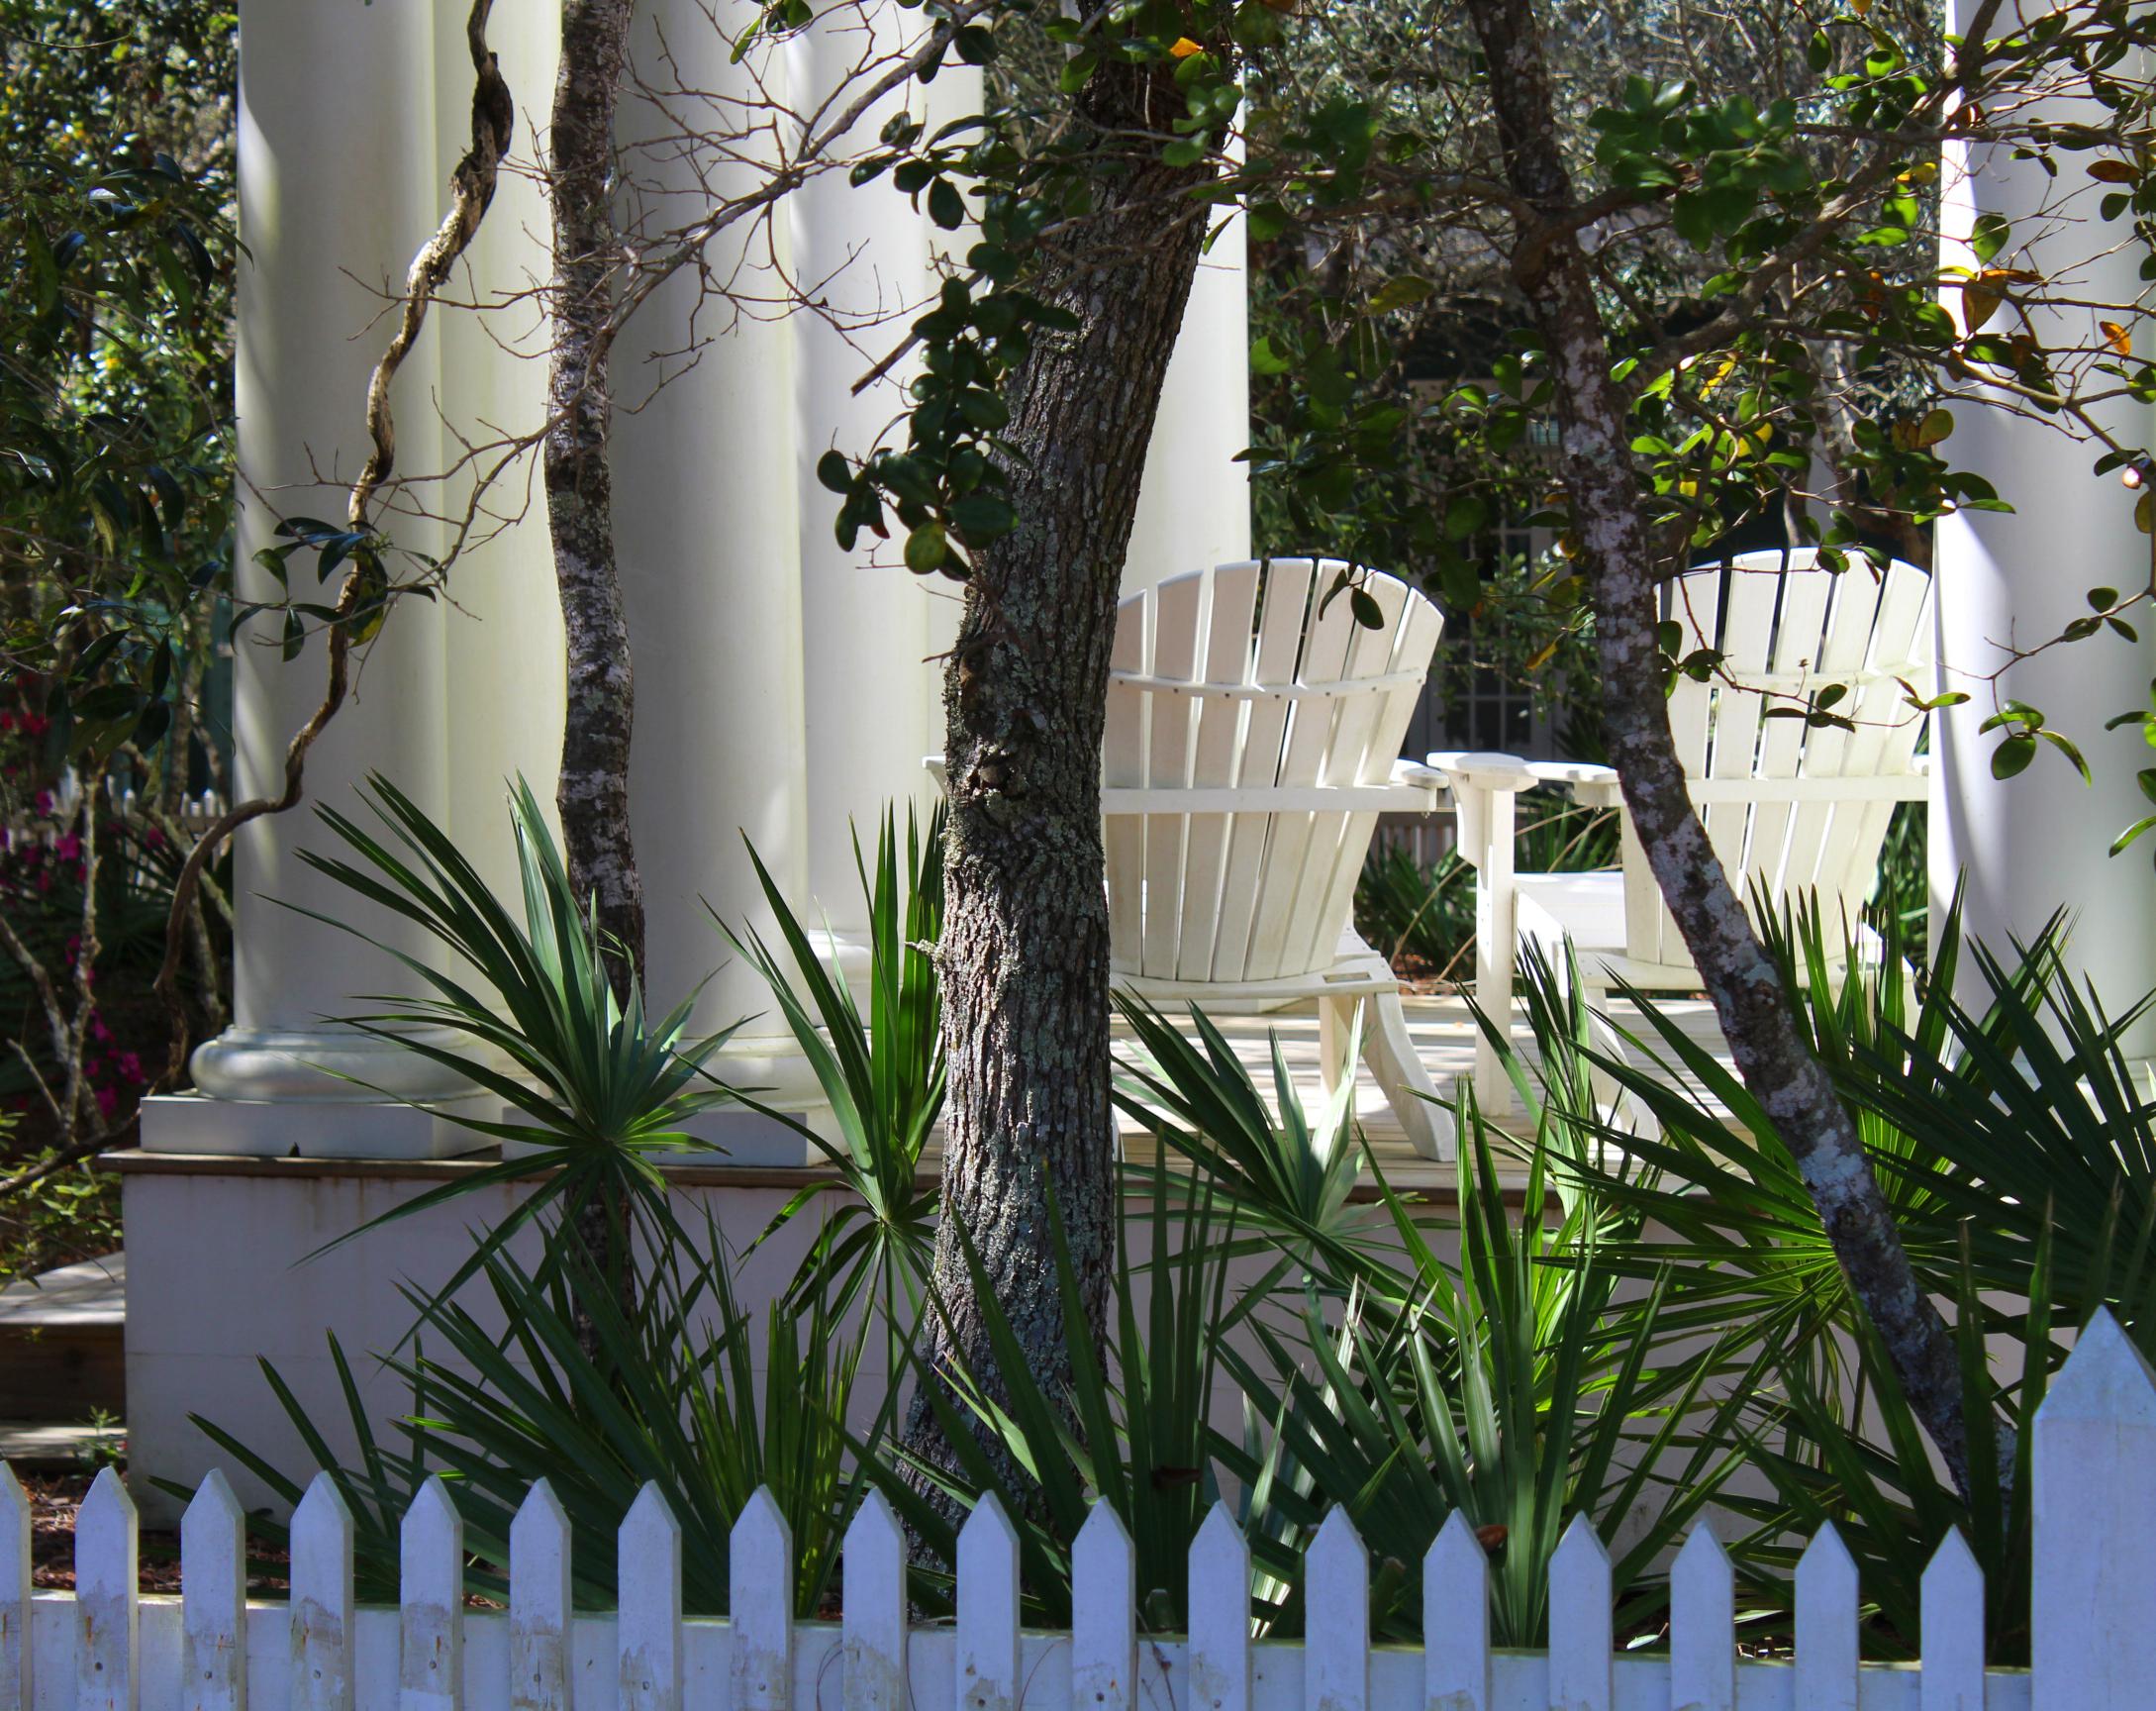 Seaside Florida Porch Midlife Snowbird